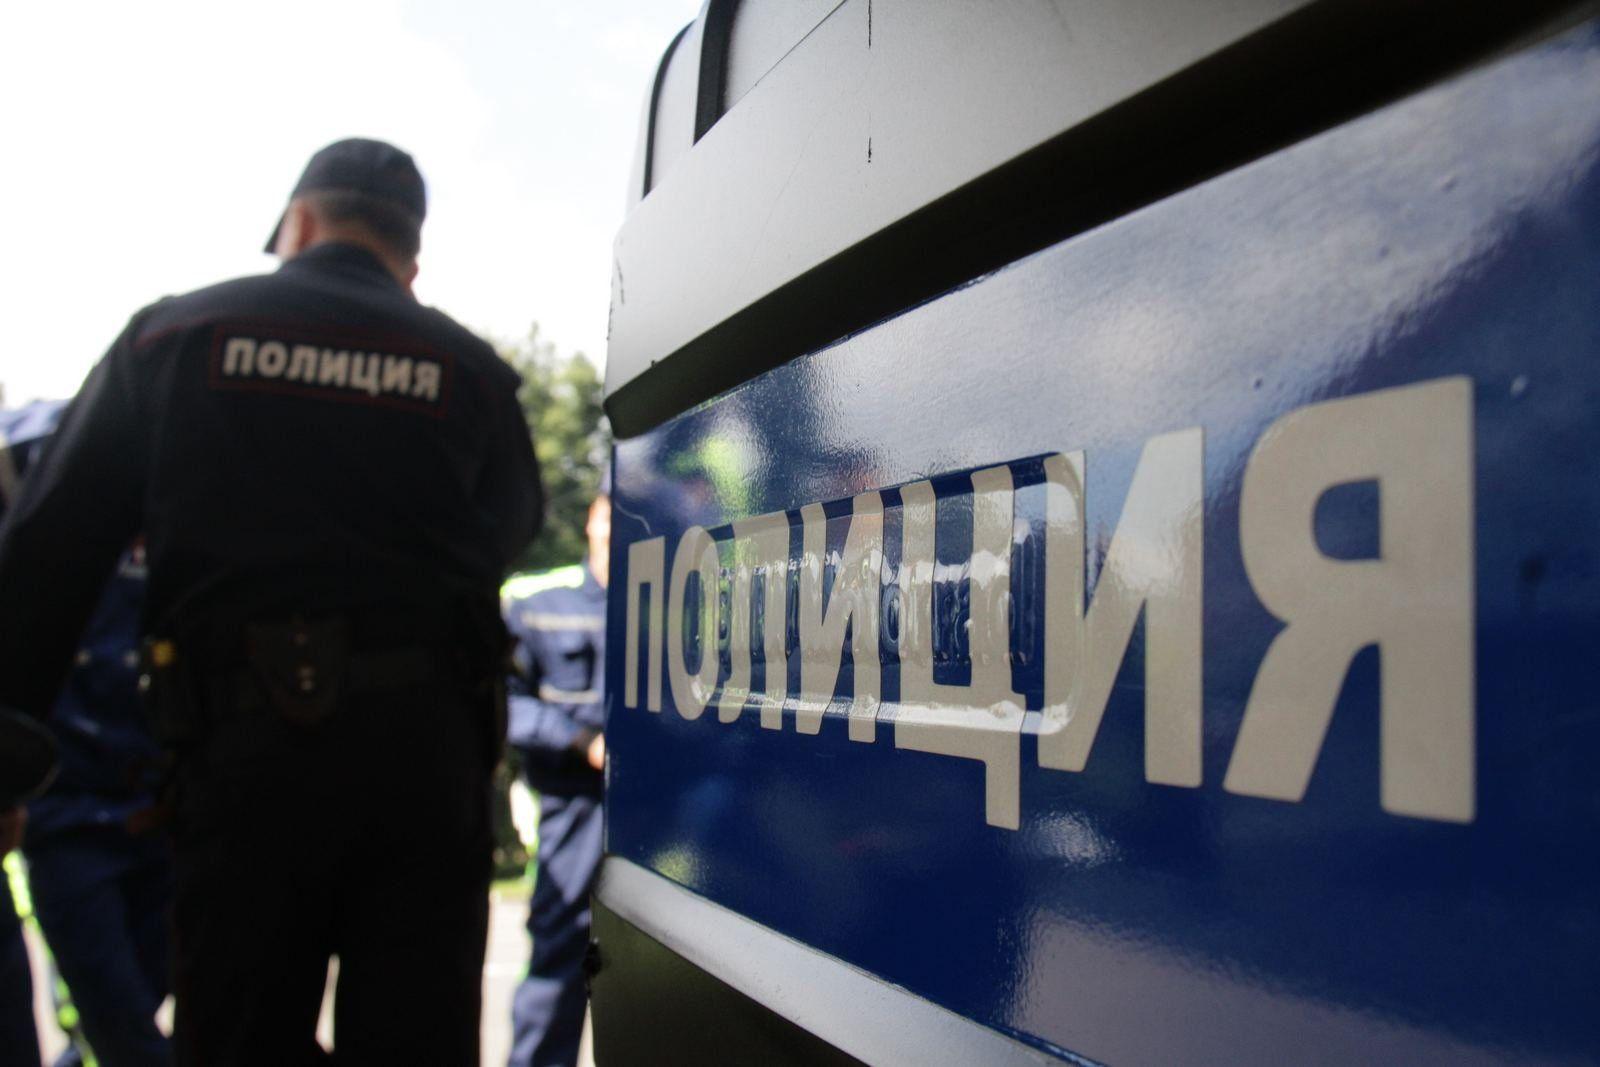 ВПятигорске арестовали уклониста отадминистративного наказания